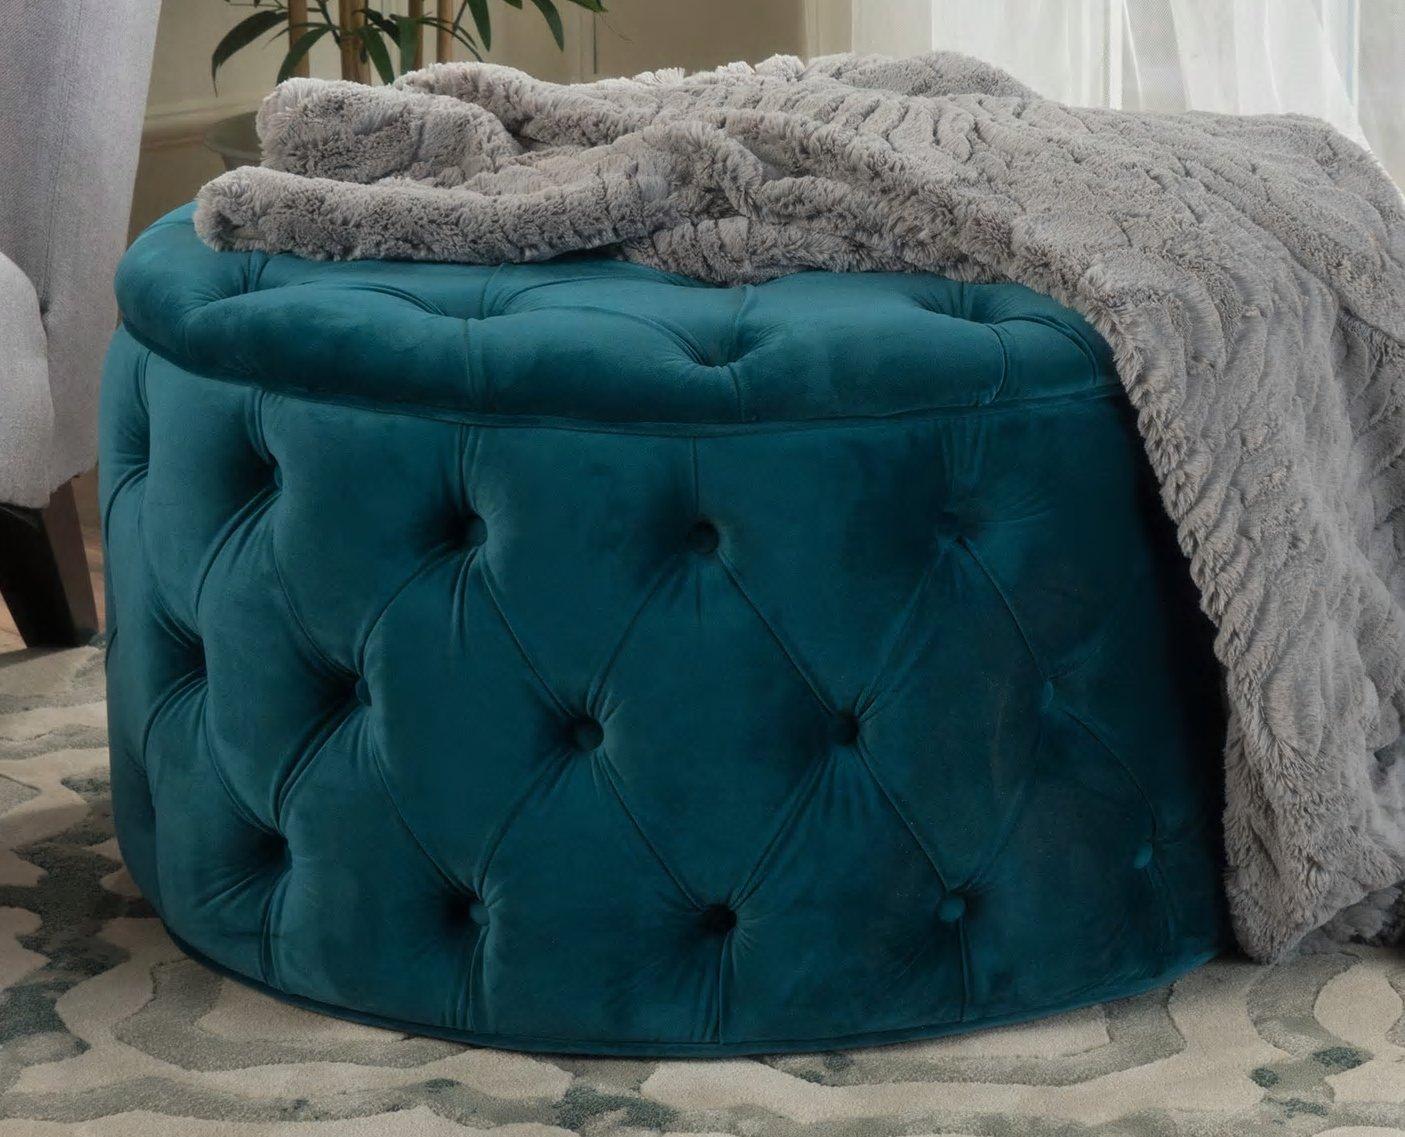 Swell Amazon Com Pop Dark Teal Tufted Soft Velvet Fabric Round Andrewgaddart Wooden Chair Designs For Living Room Andrewgaddartcom